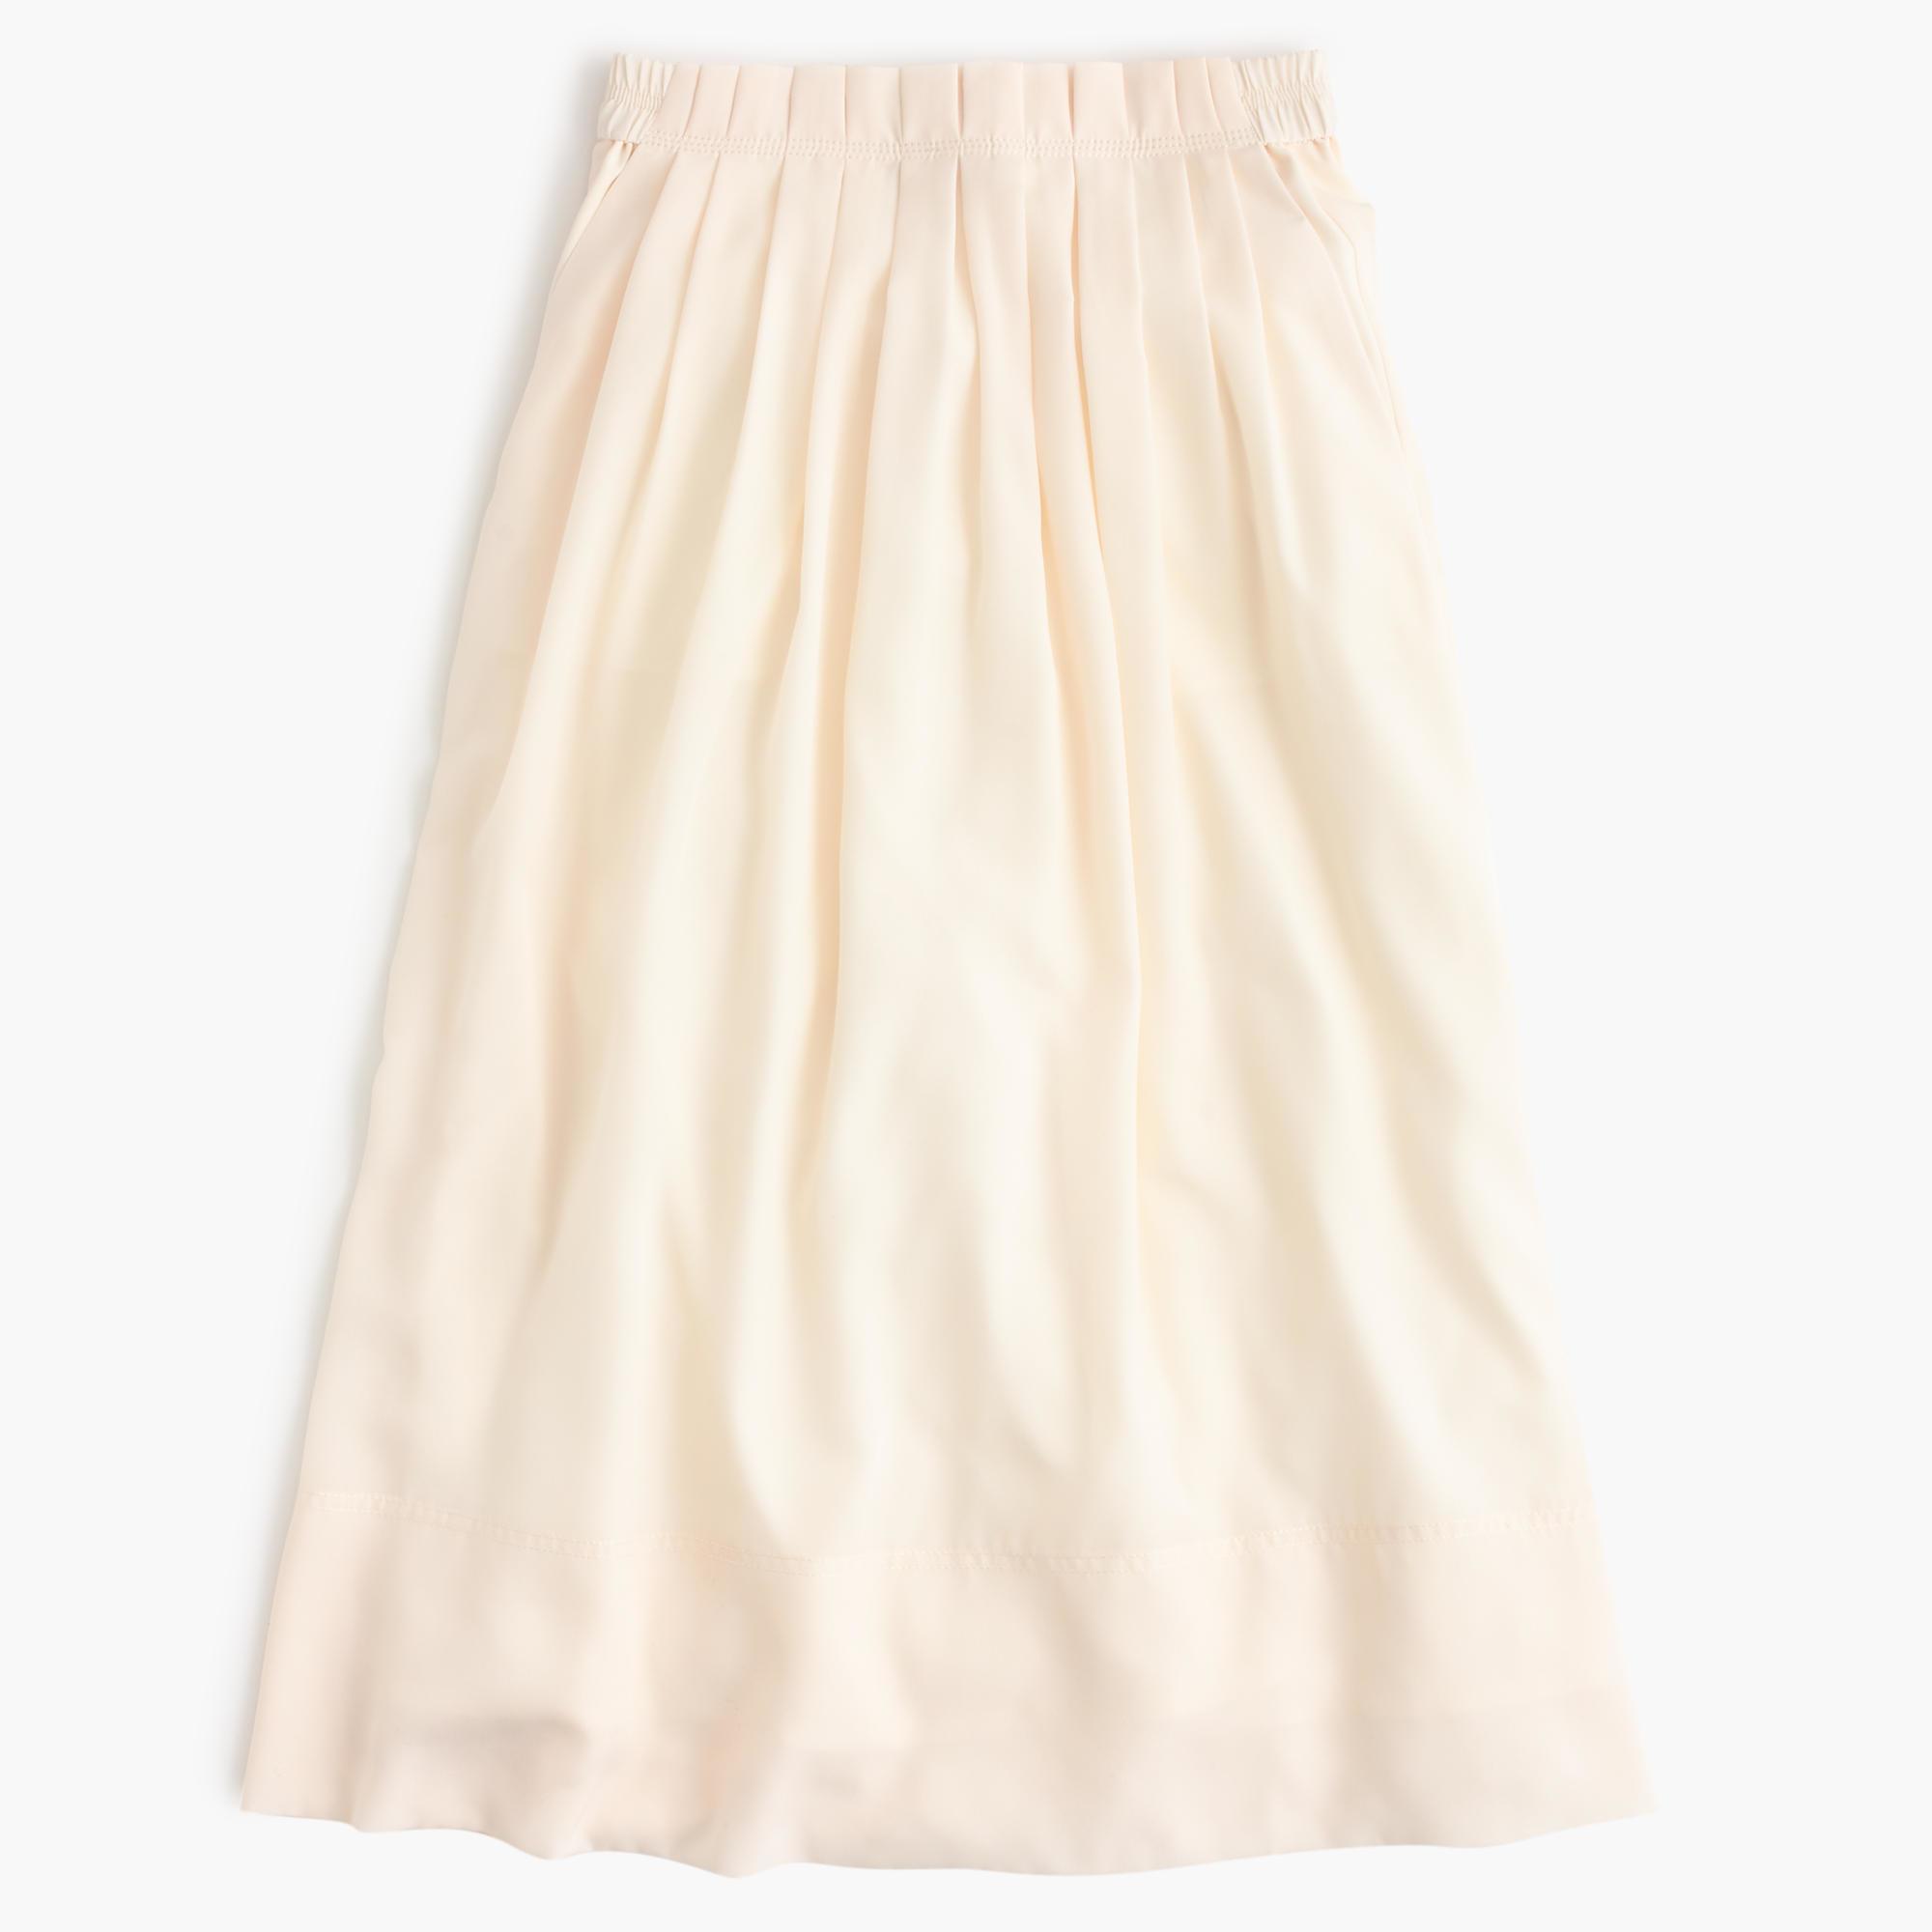 j crew pleated midi skirt in beige flannel lyst